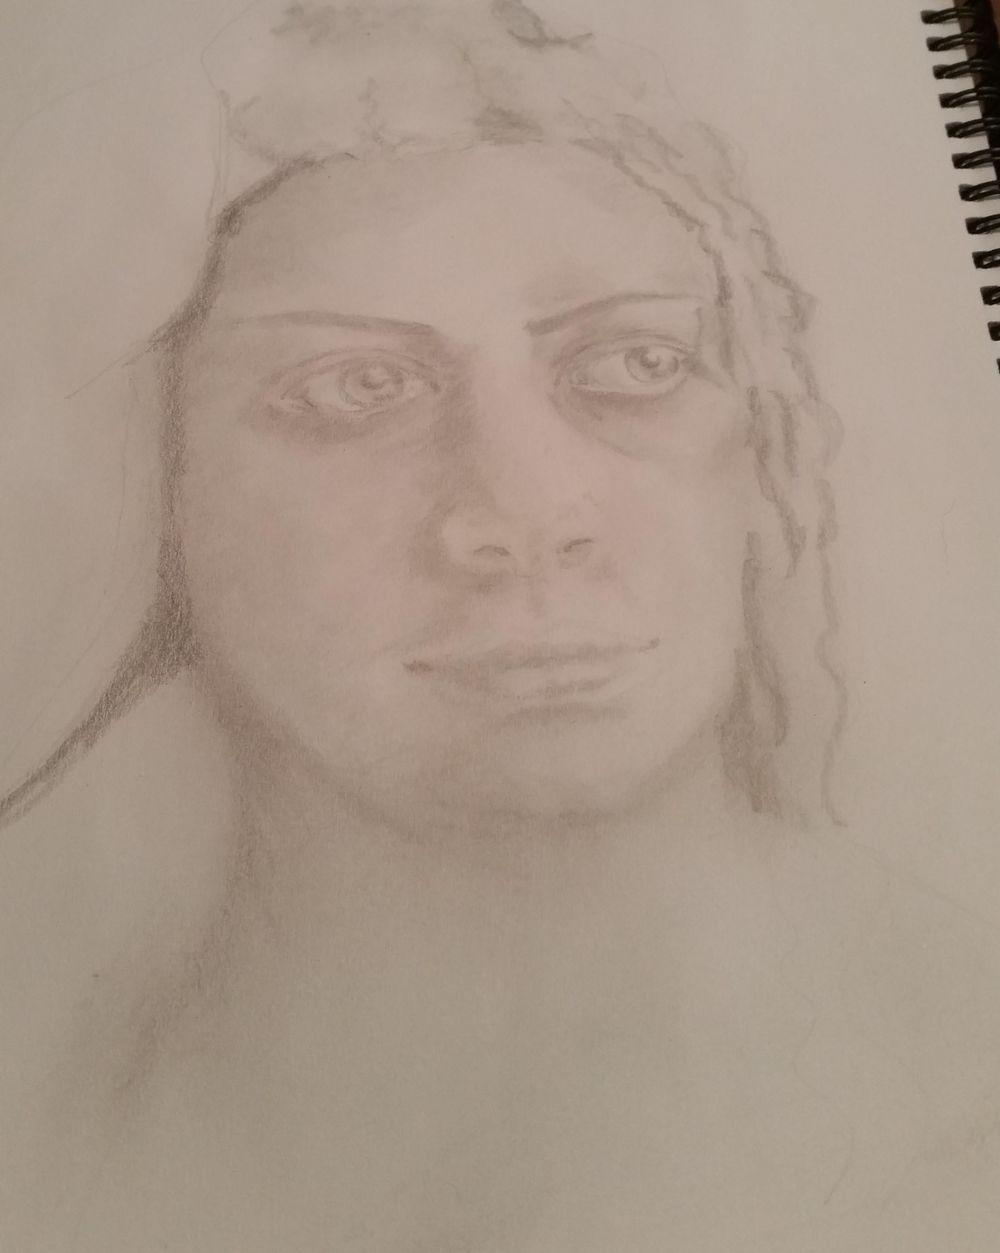 Portrait of a stranger ... - image 2 - student project